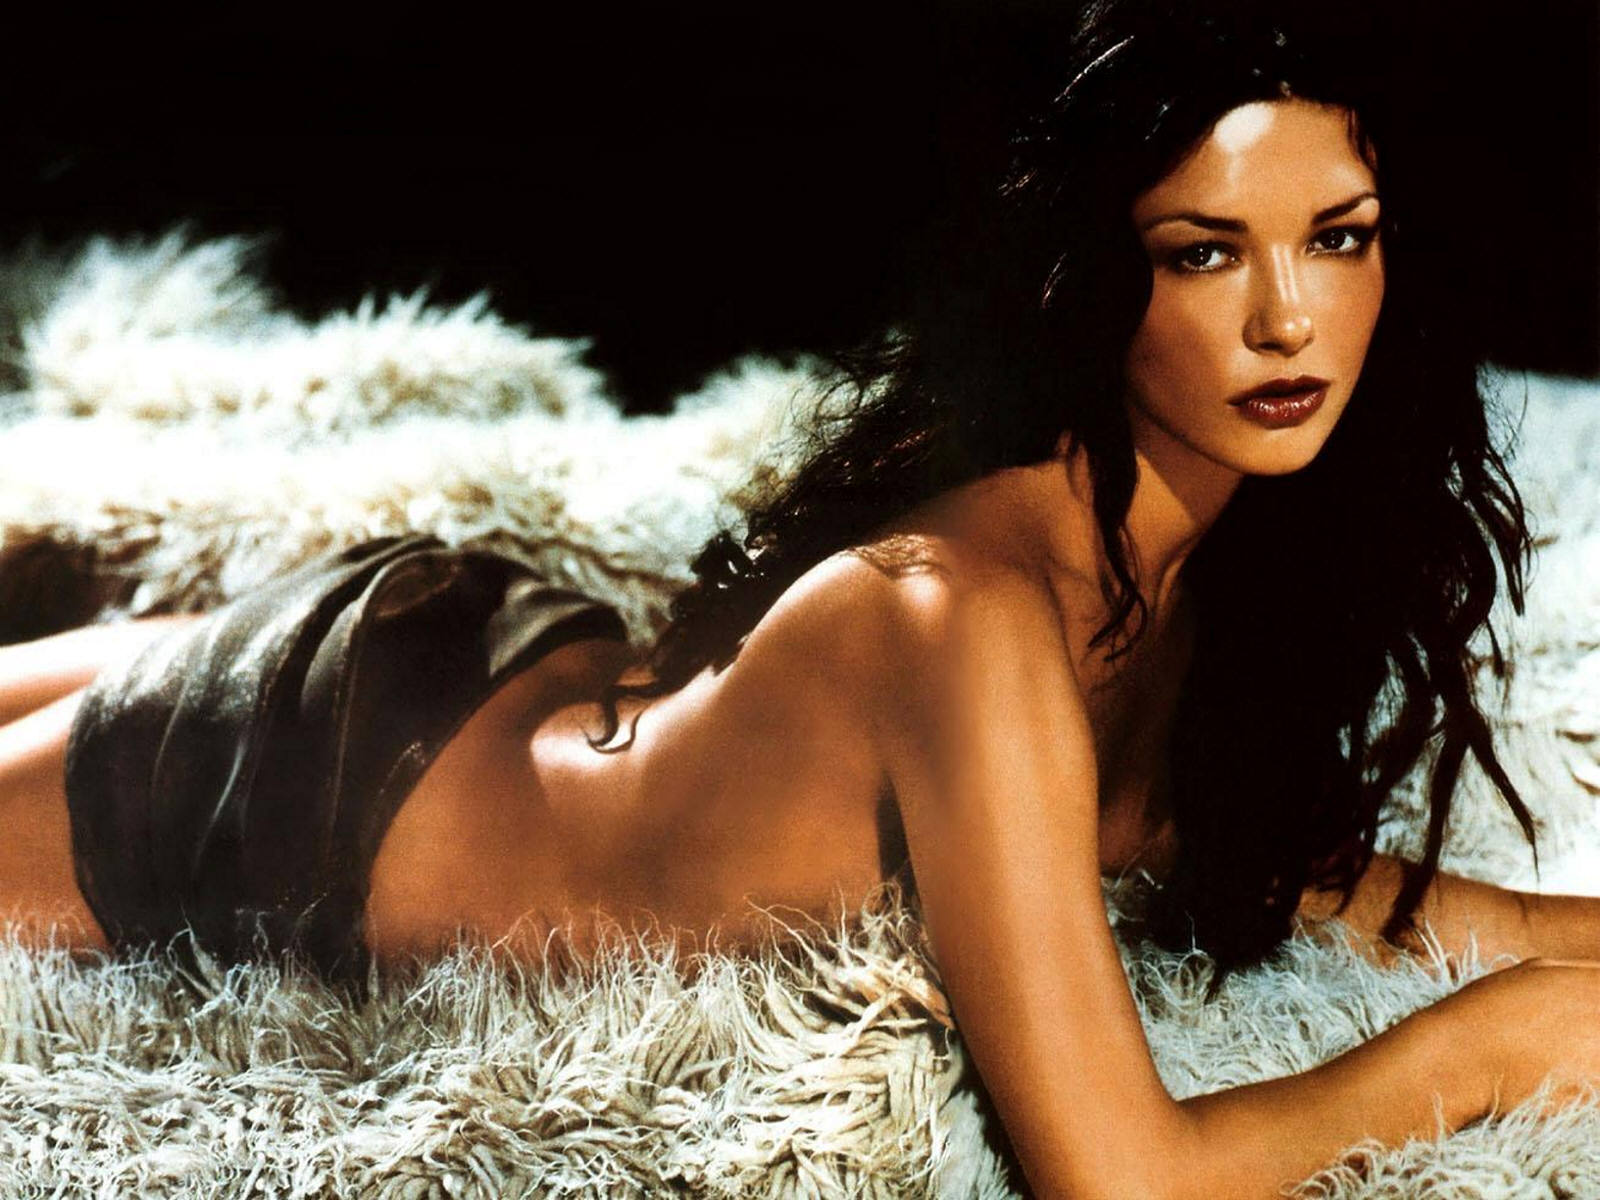 http://3.bp.blogspot.com/-lLF8mqLr_-8/T9R0TTRnnwI/AAAAAAAAALM/W-5QHSAFPaA/s1600/088_Catherine_Zeta-Jones_topless_wallpaper.jpg